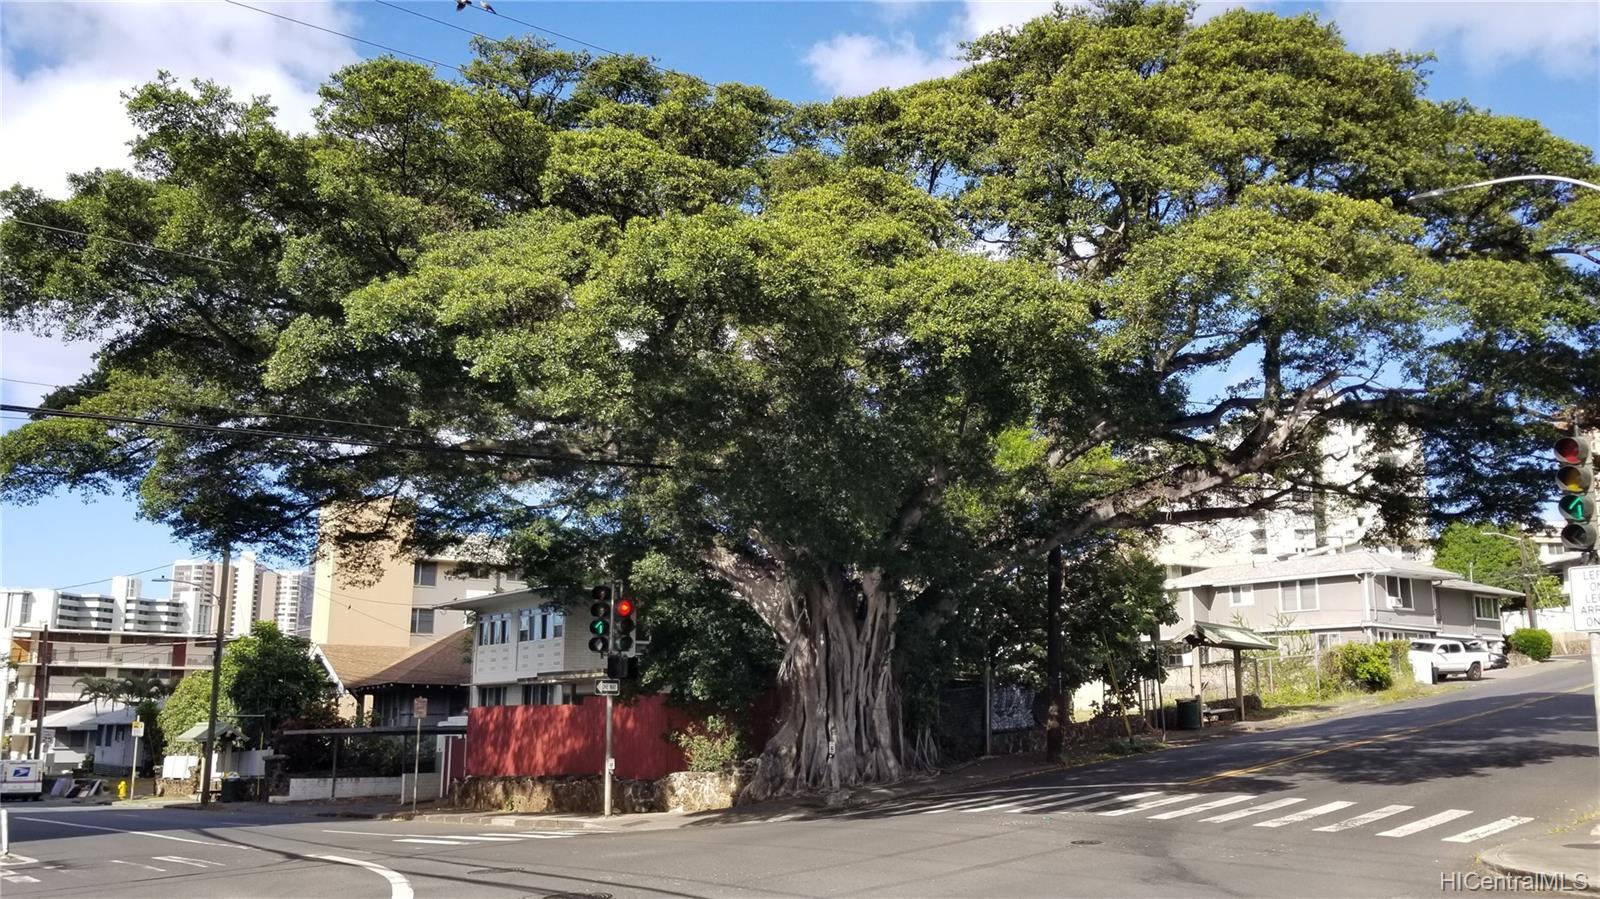 1576 Pensacola Street Honolulu - Multi-family - photo 20 of 20